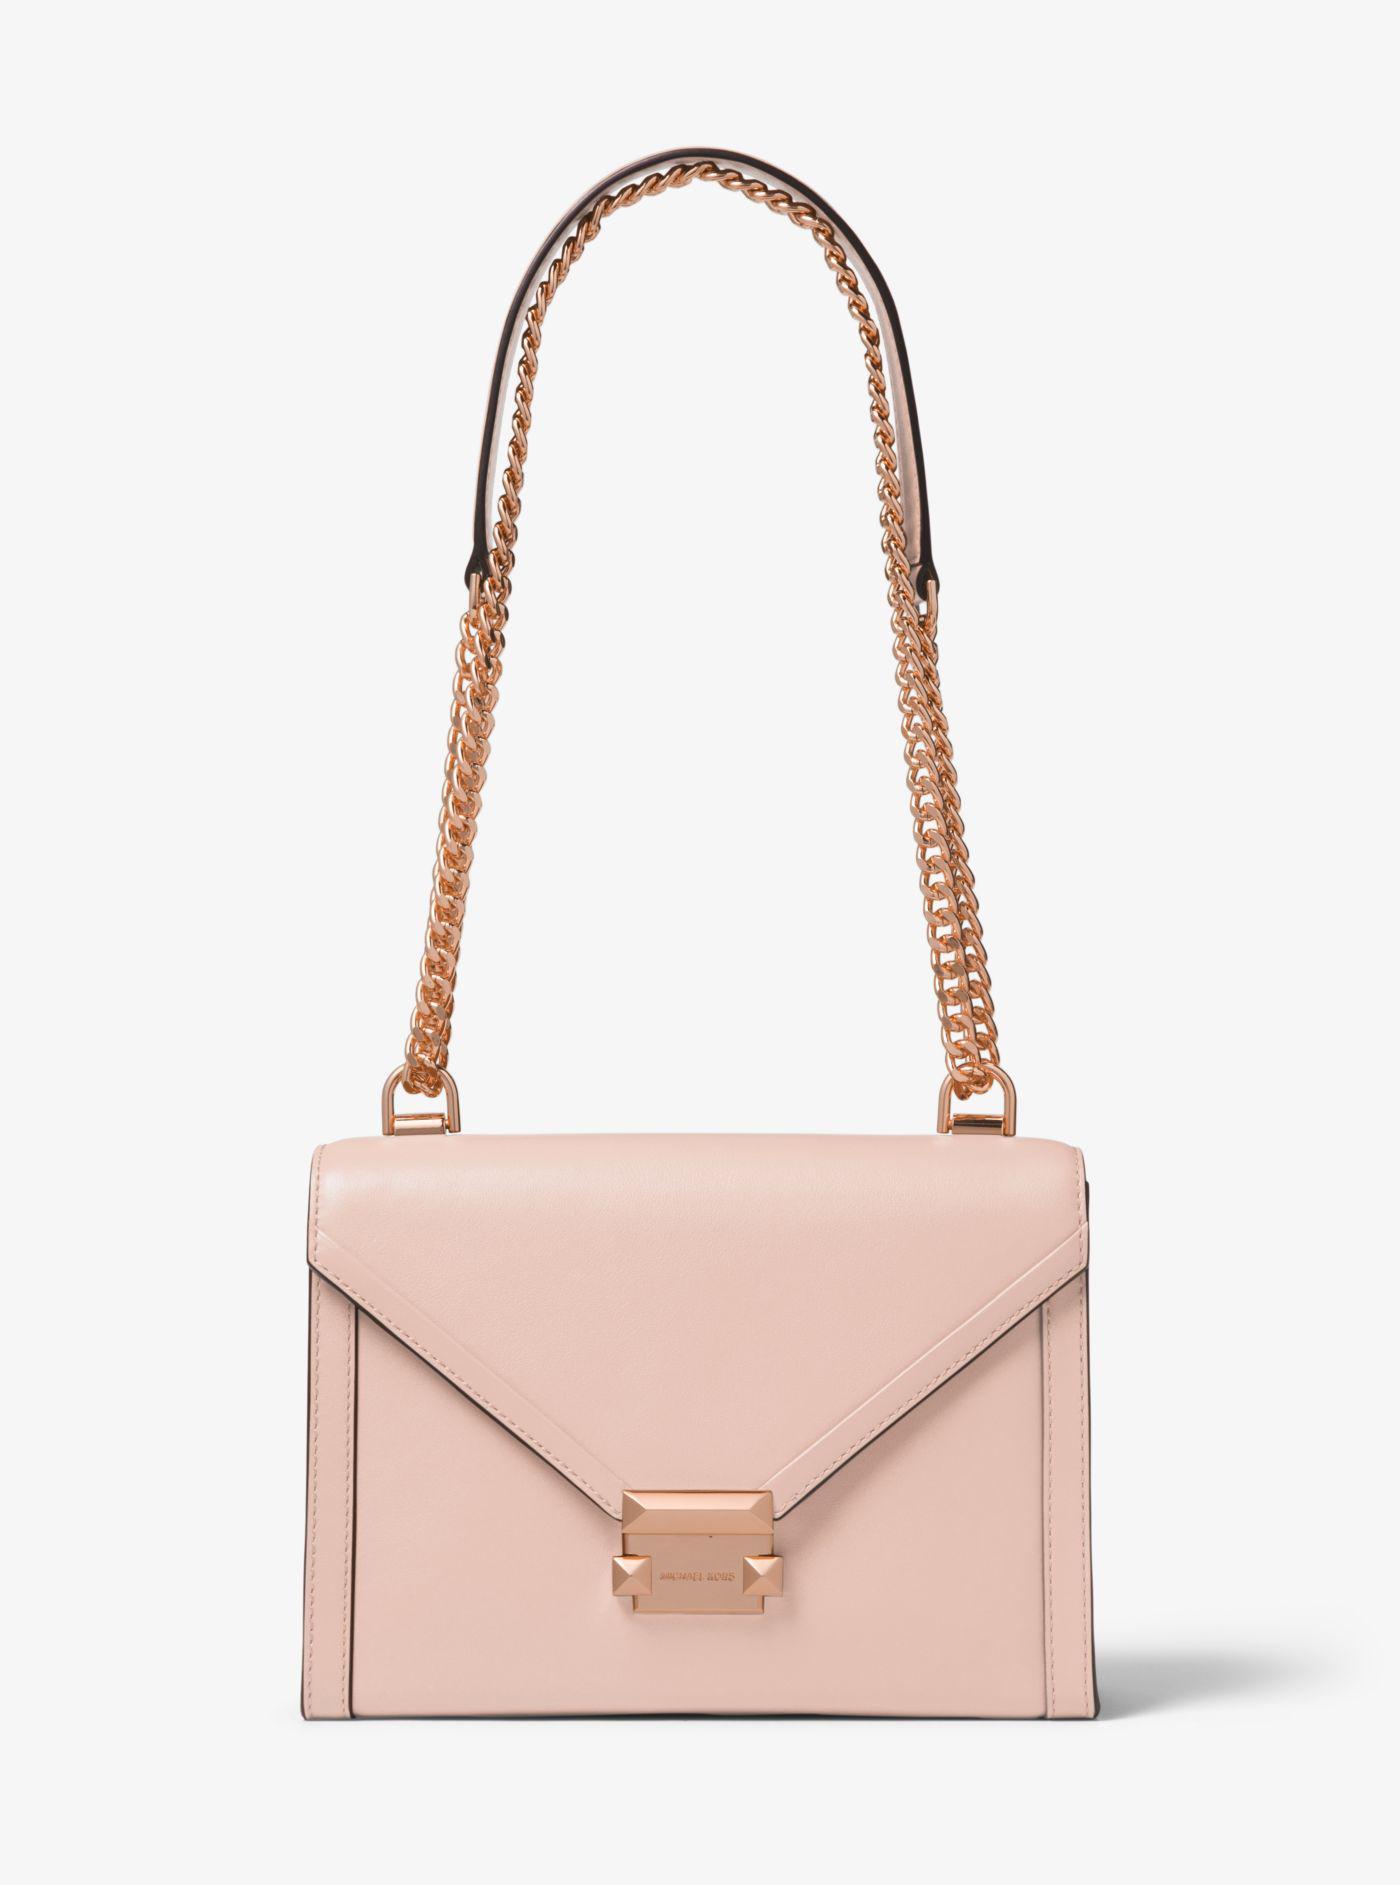 Michael Kors. Women s Pink Whitney Large Leather Convertible Shoulder Bag b3e7d475a196